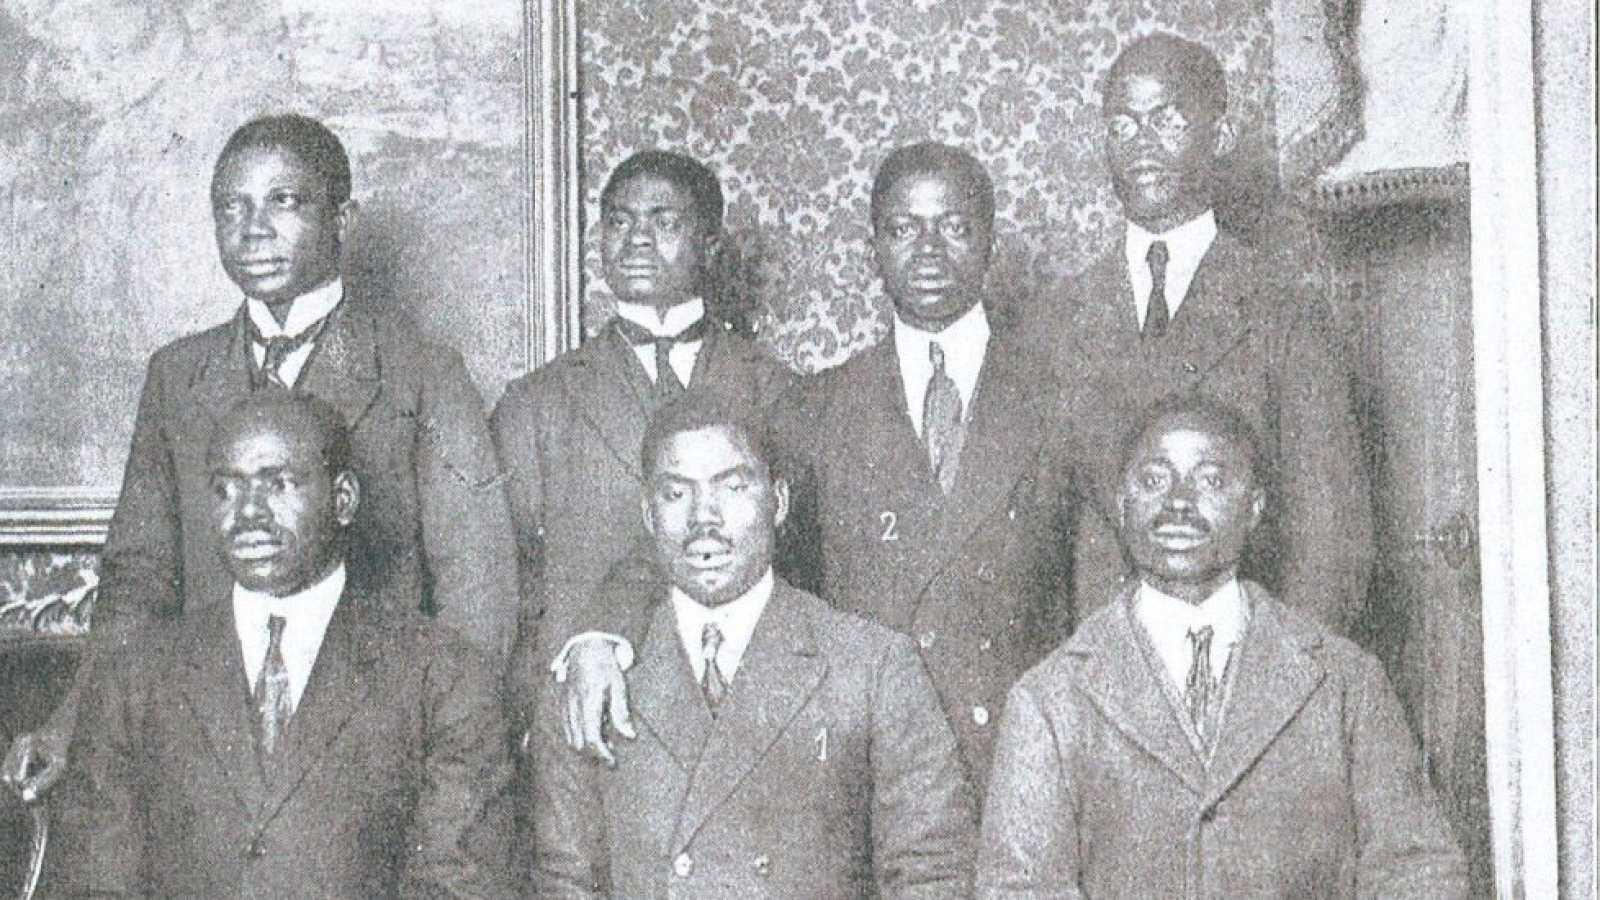 África hoy - La visita del rey camerunés Atangana a España - 17/12/20 - escuchar ahora